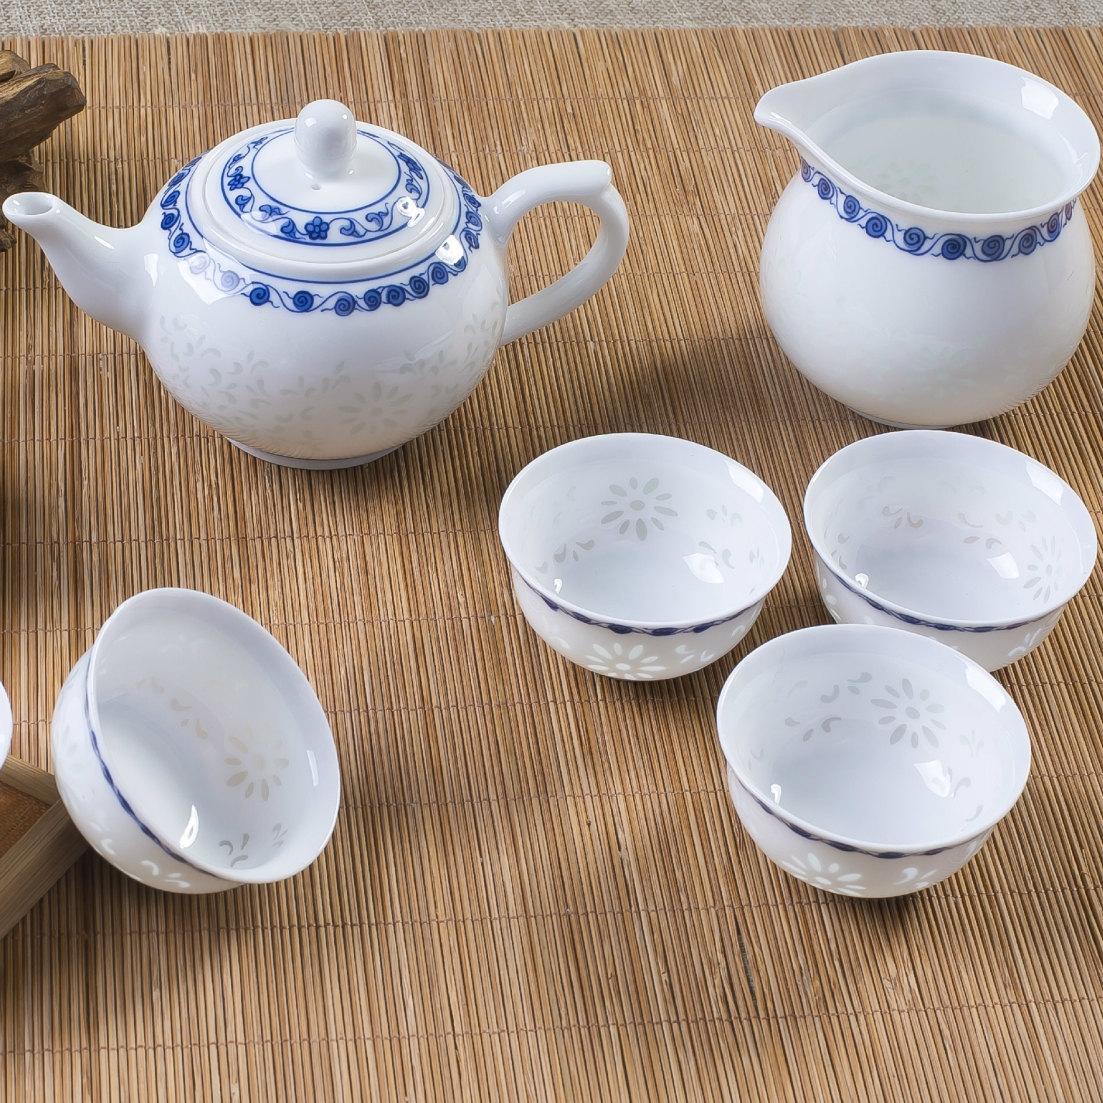 Handmade ceramic tea sets